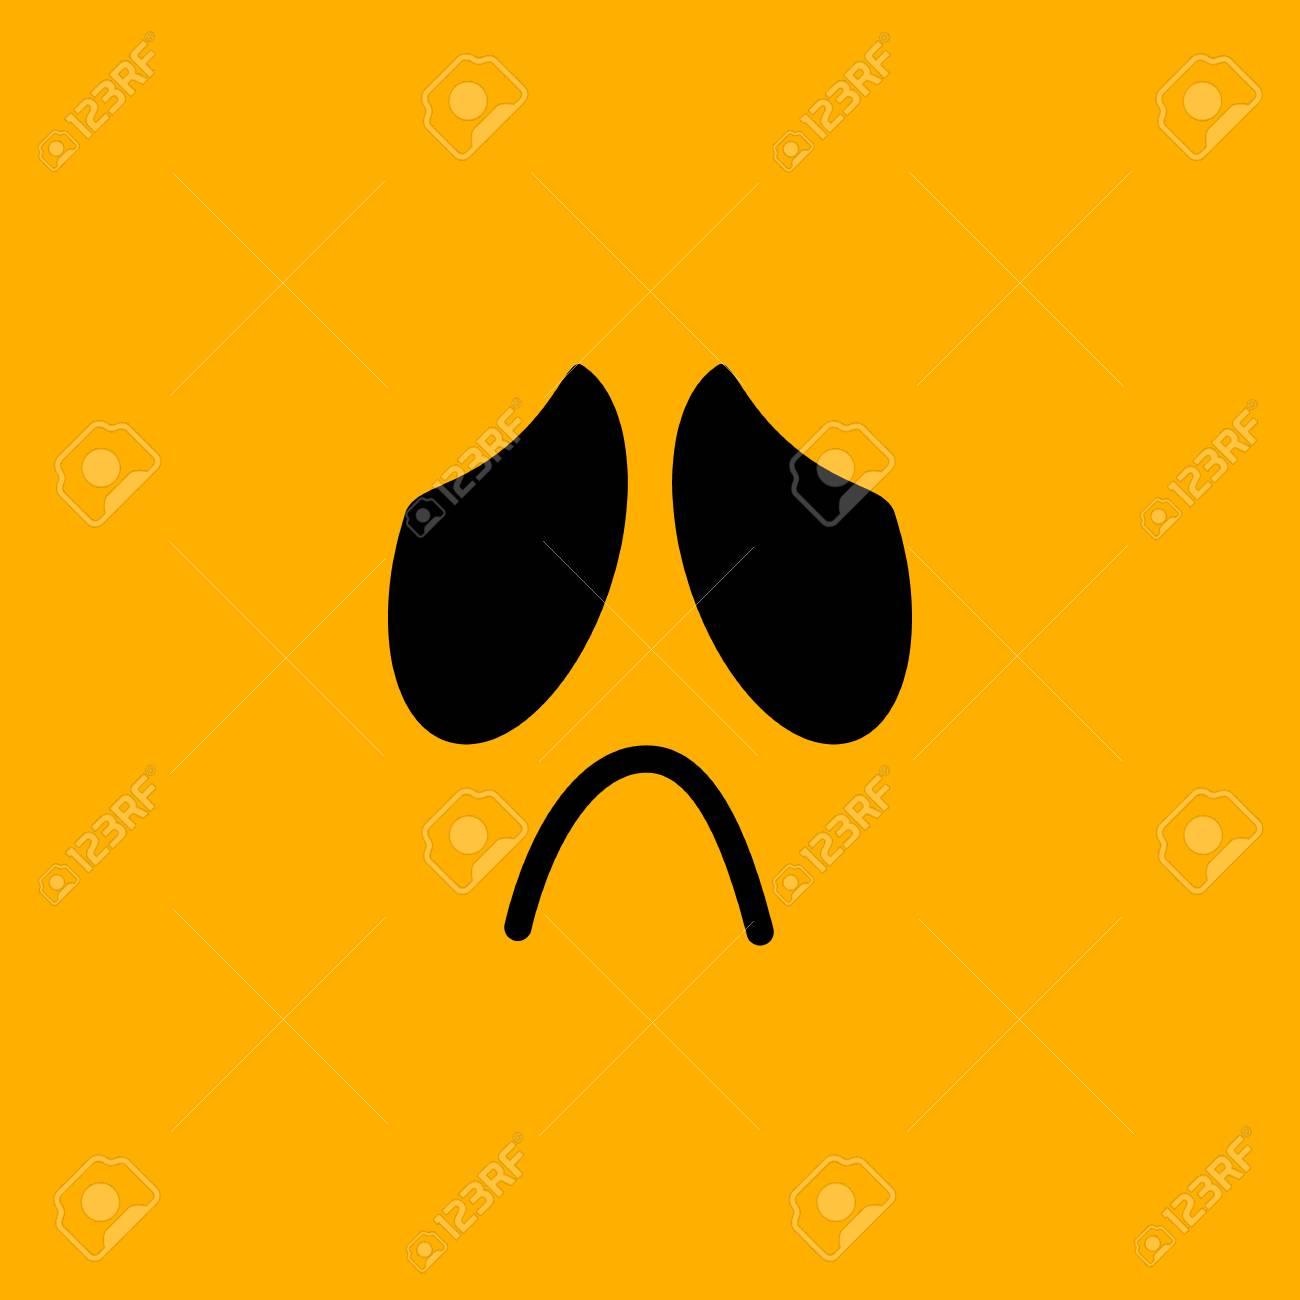 Yellow emoticon face, sad, vector illustration - 94158465